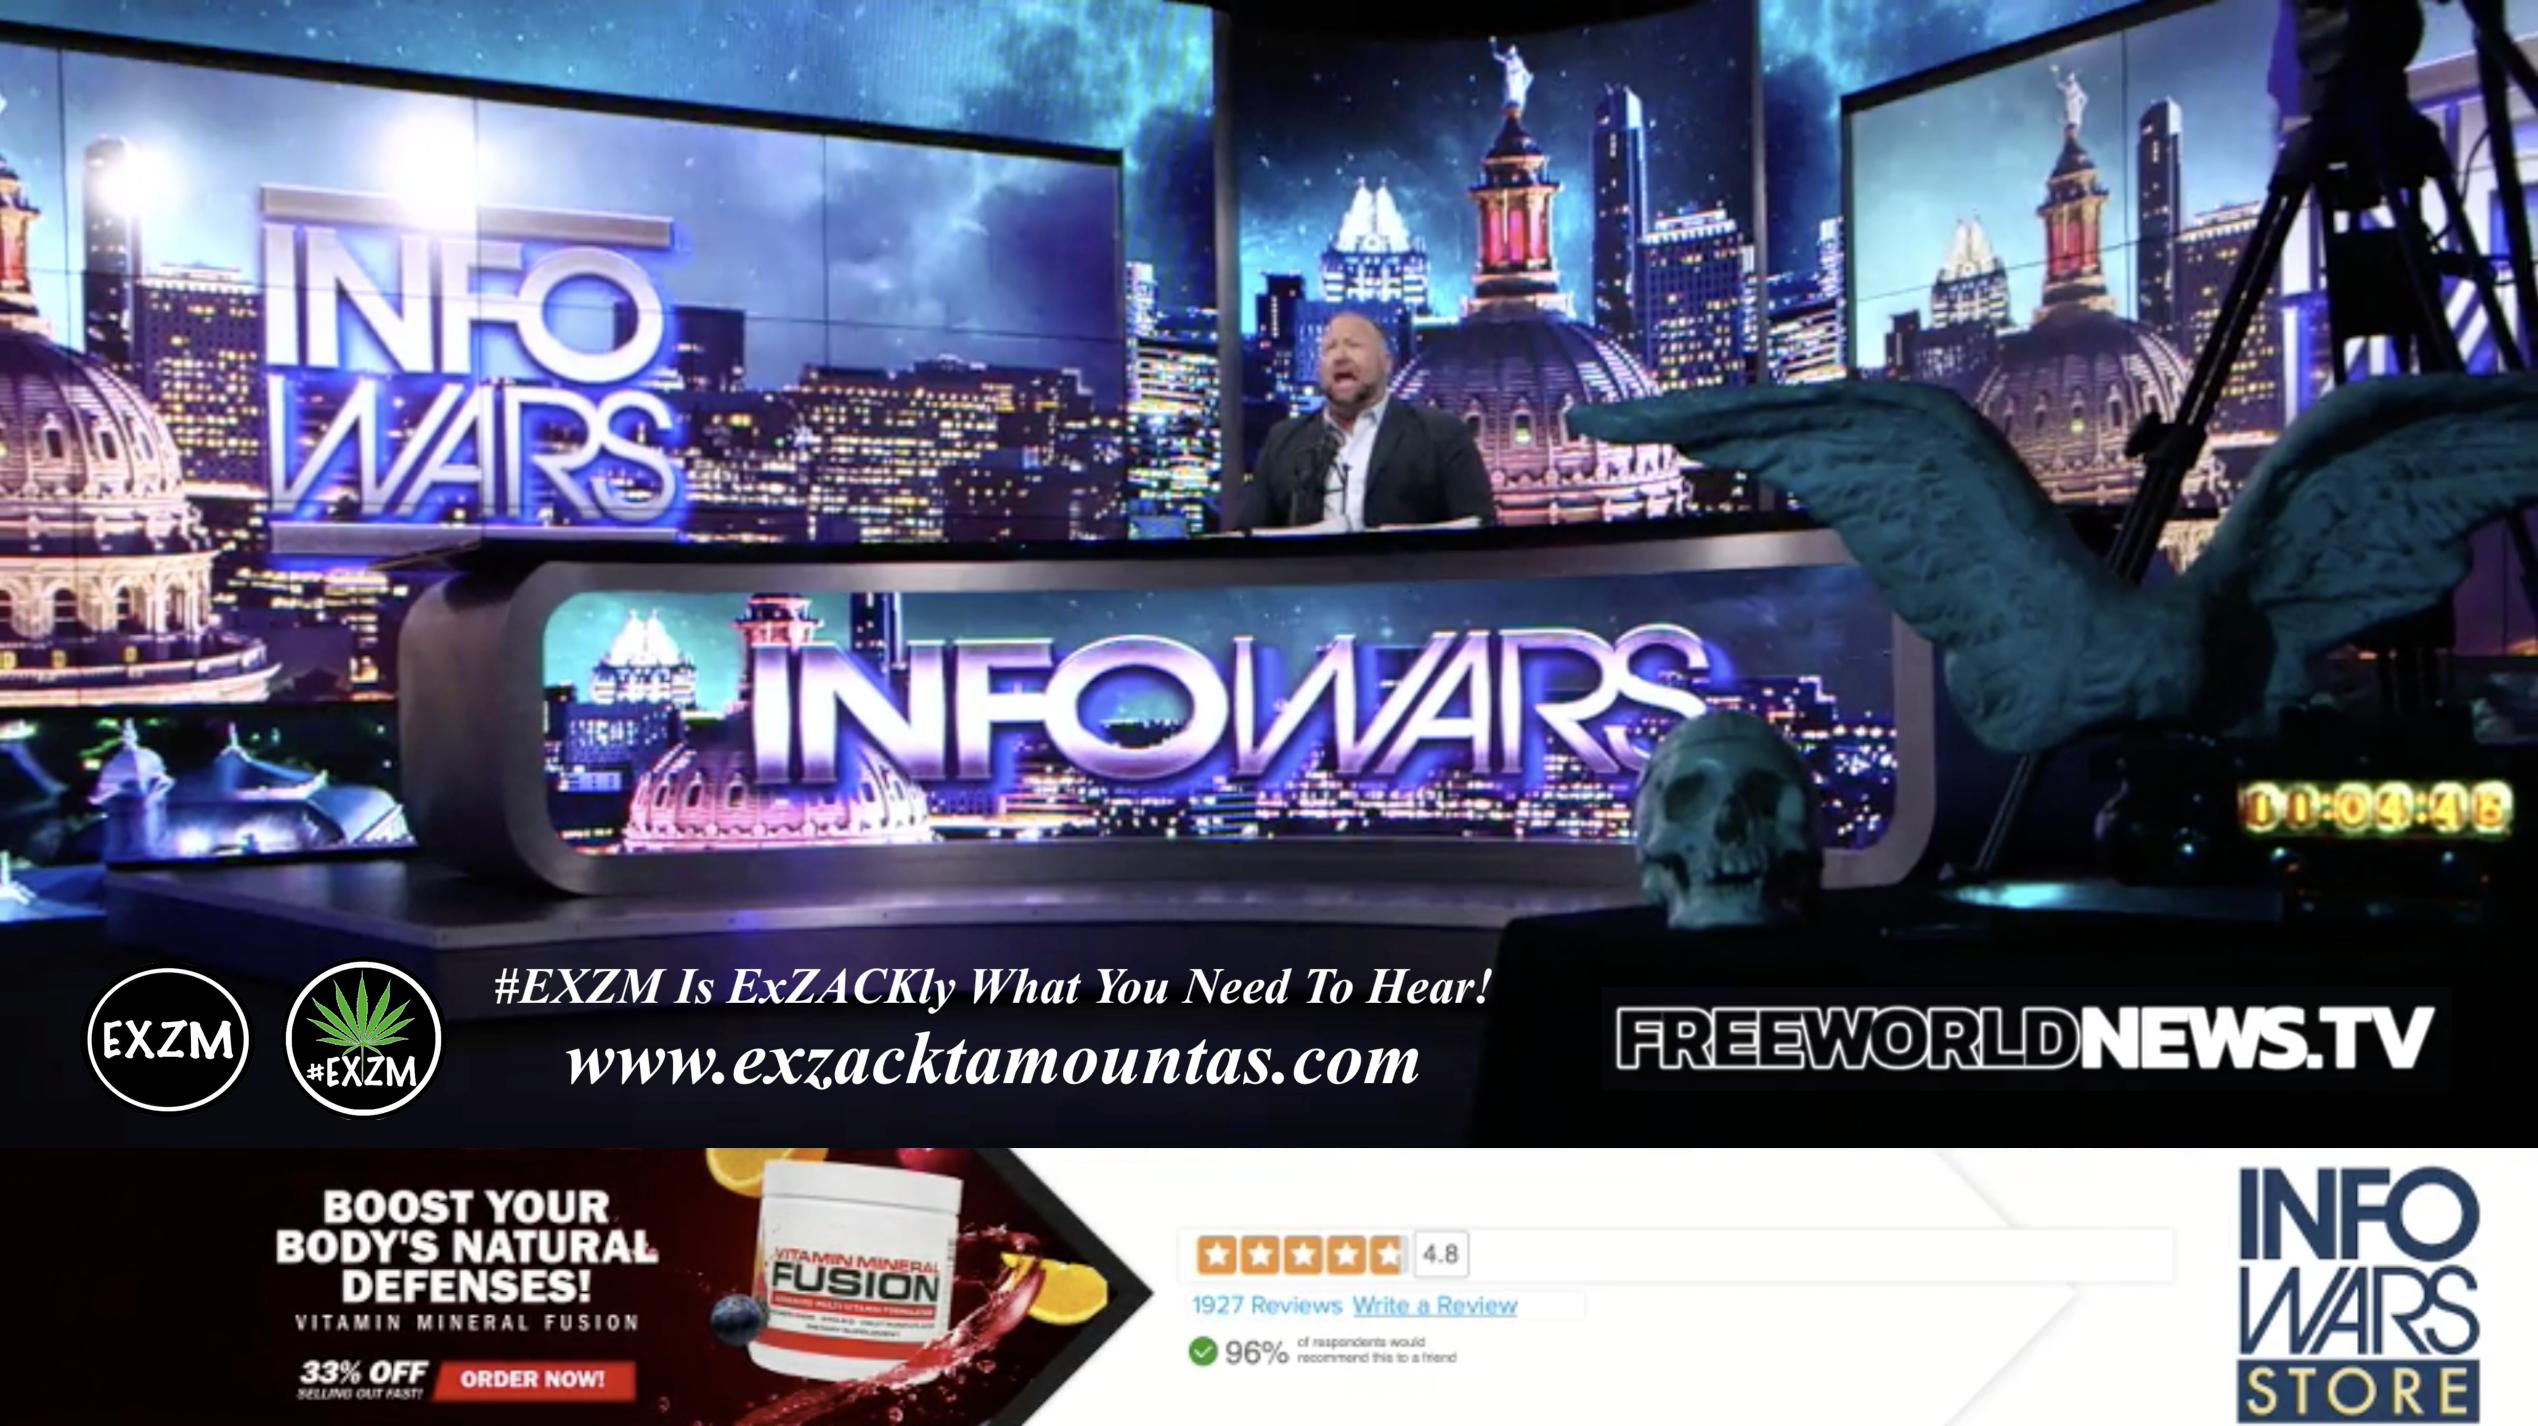 Alex Jones Live In Infowars Studio Human Skull Angel Wings Dagger Free World News TV EXZM Zack Mount September 10th 2021 copy